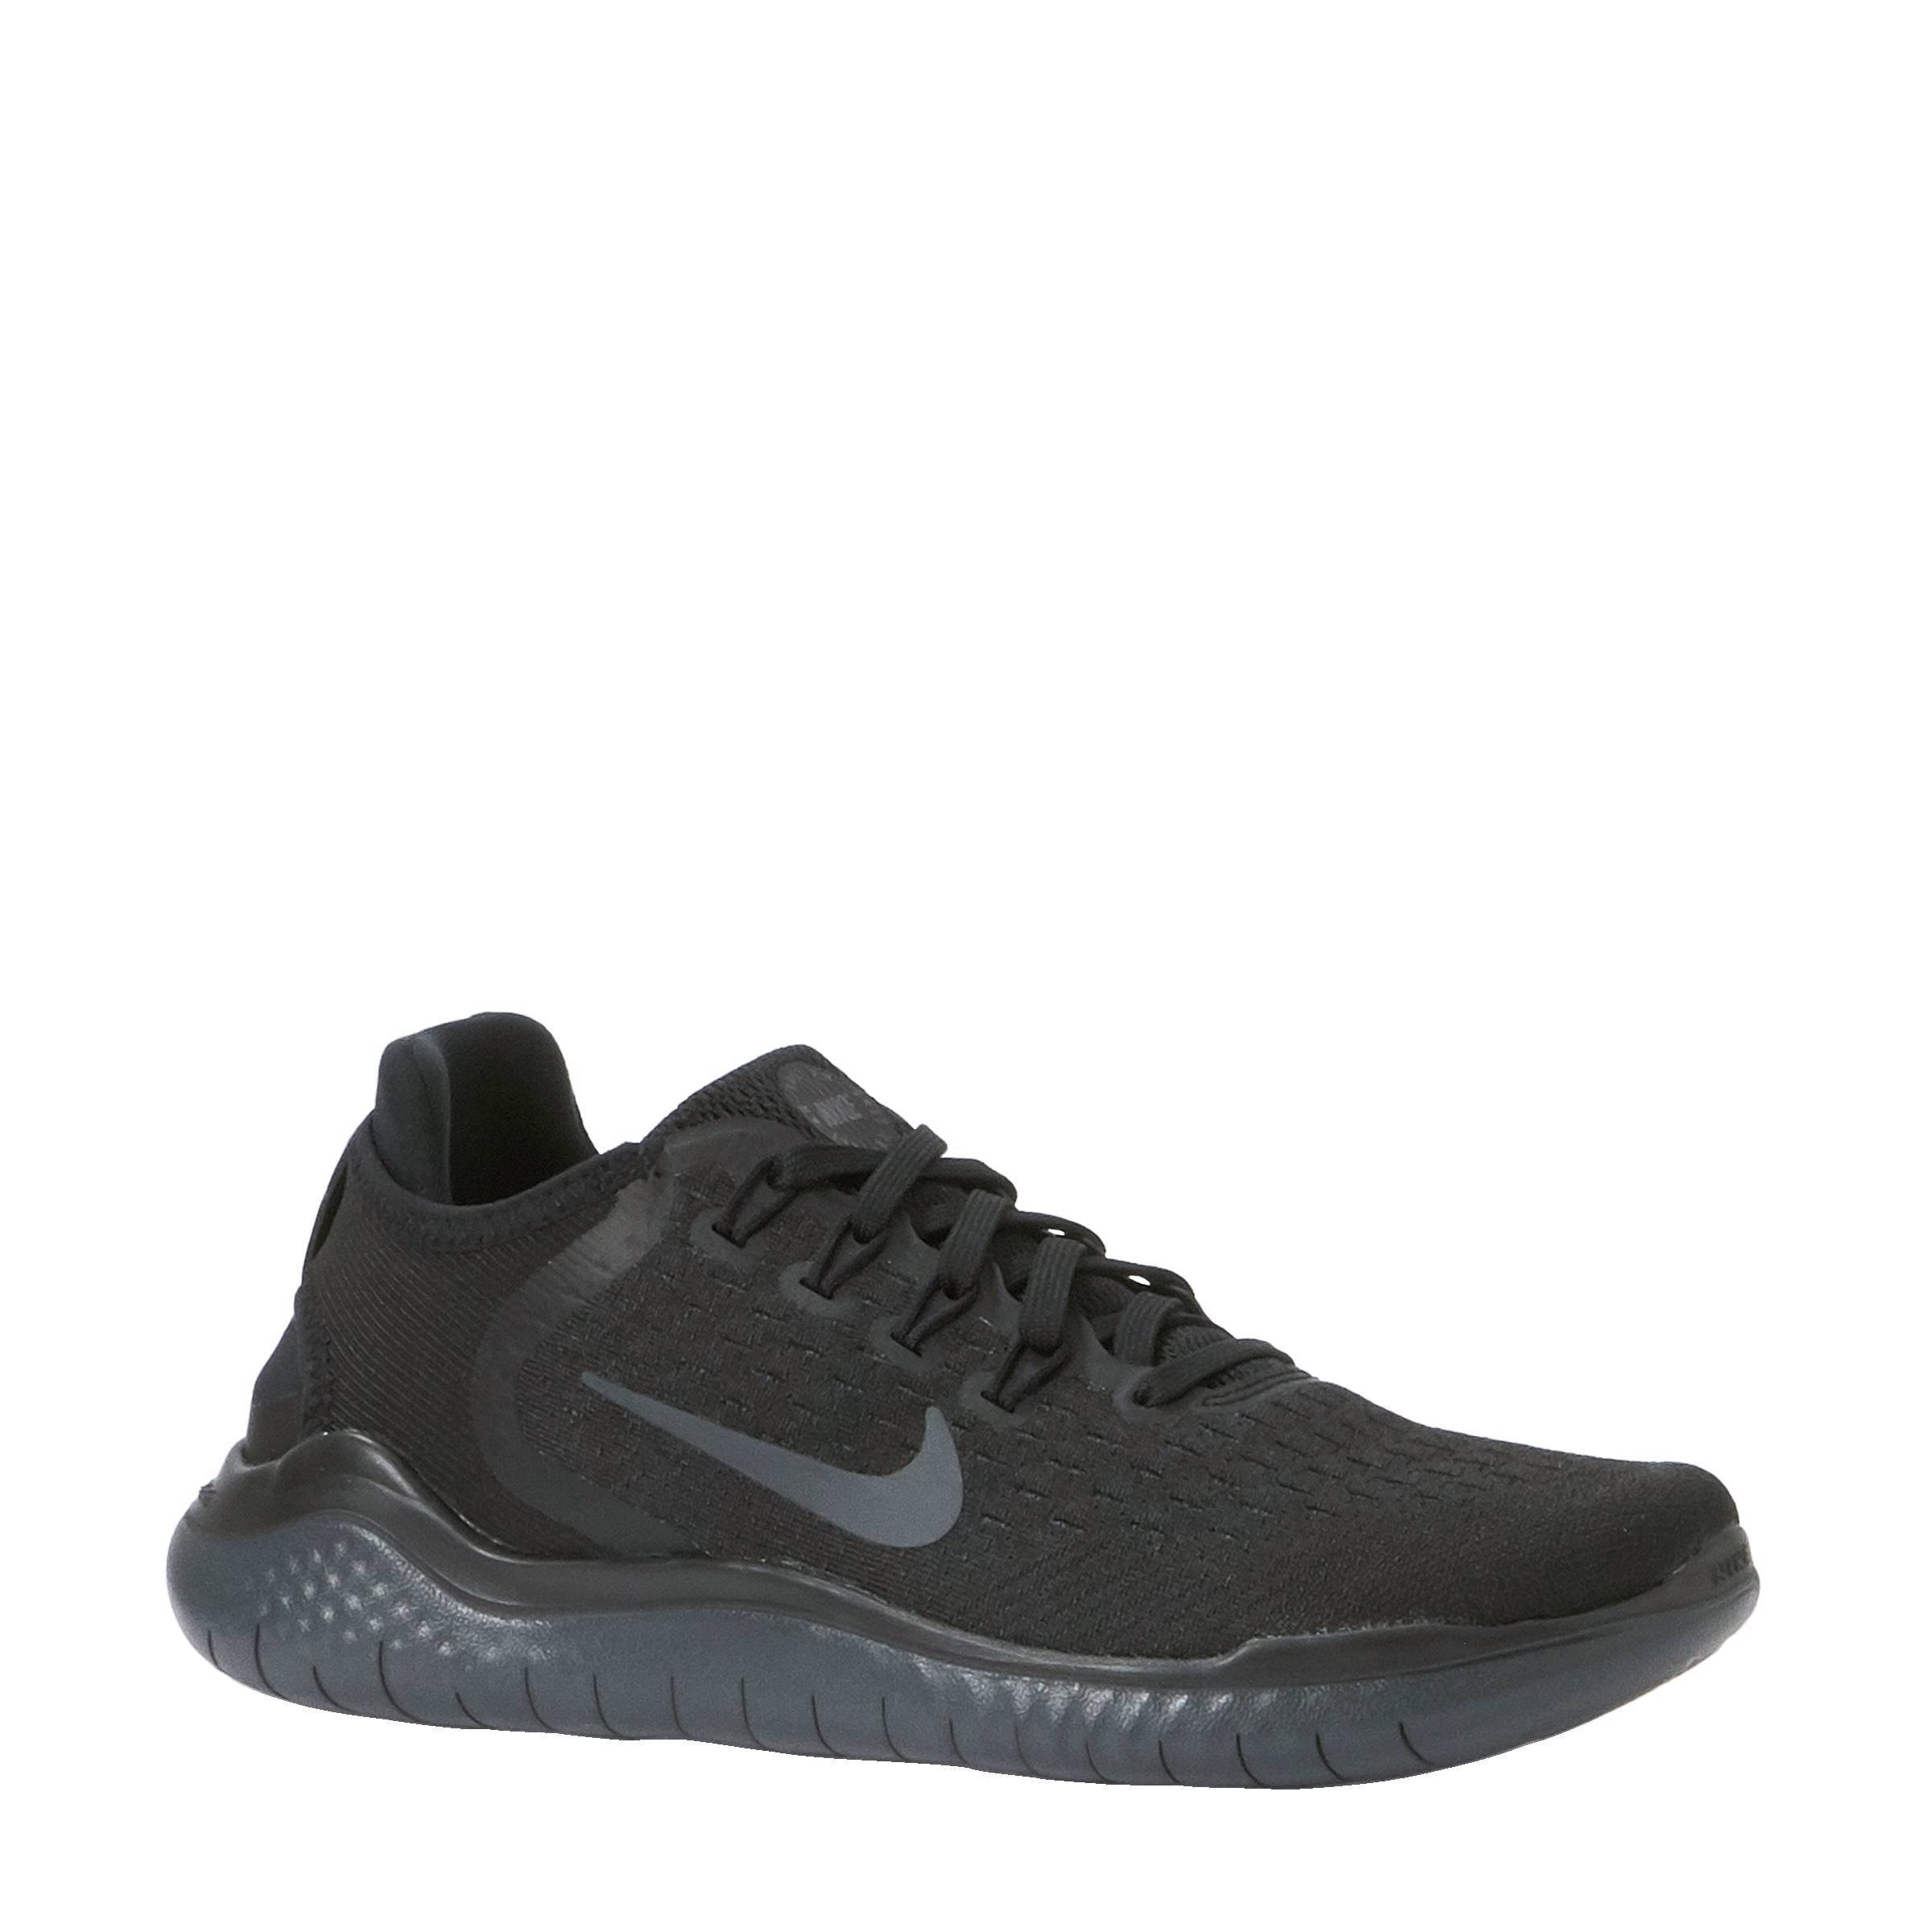 Nike FREE RN 2018 hardloopschoenen | wehkamp